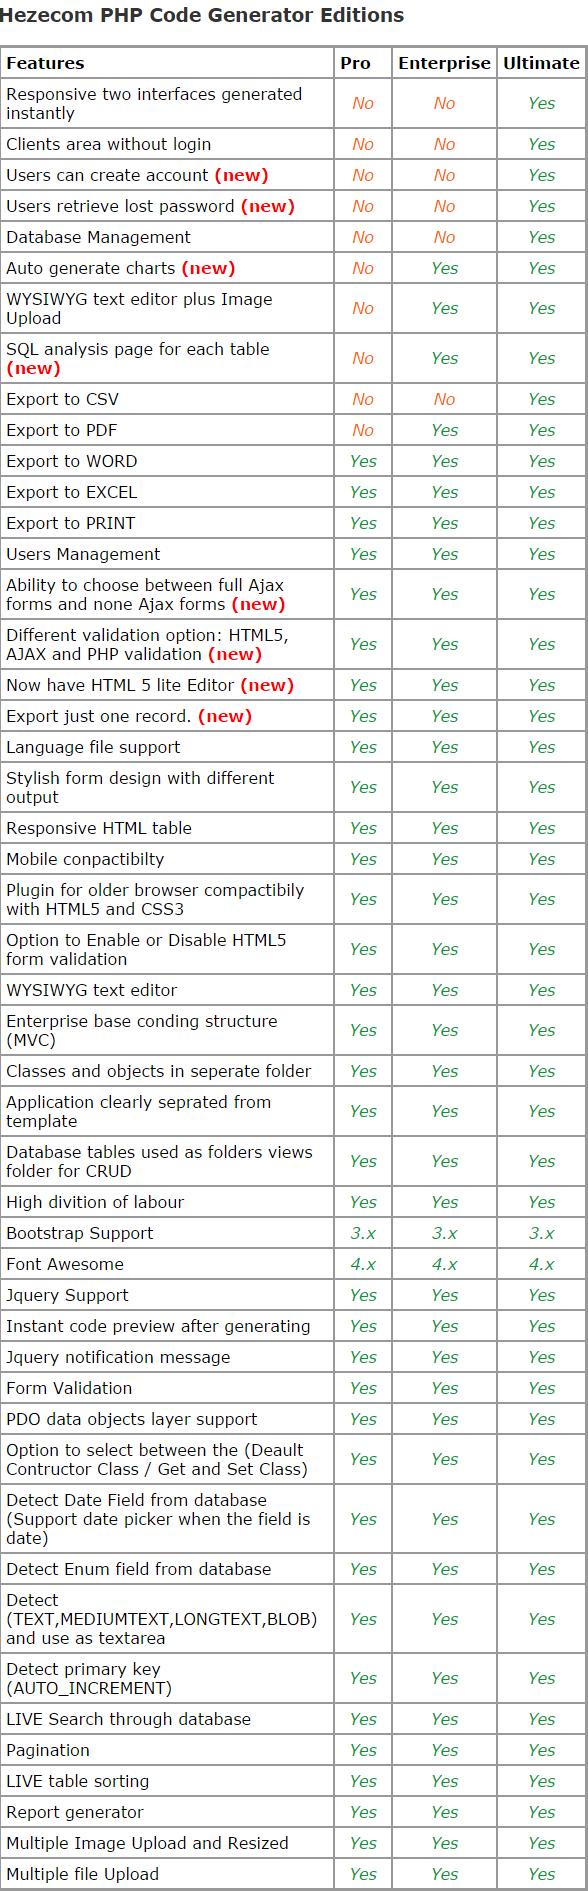 Hezecom UltimateSpeed PHP Code Generator Ultimate - 4